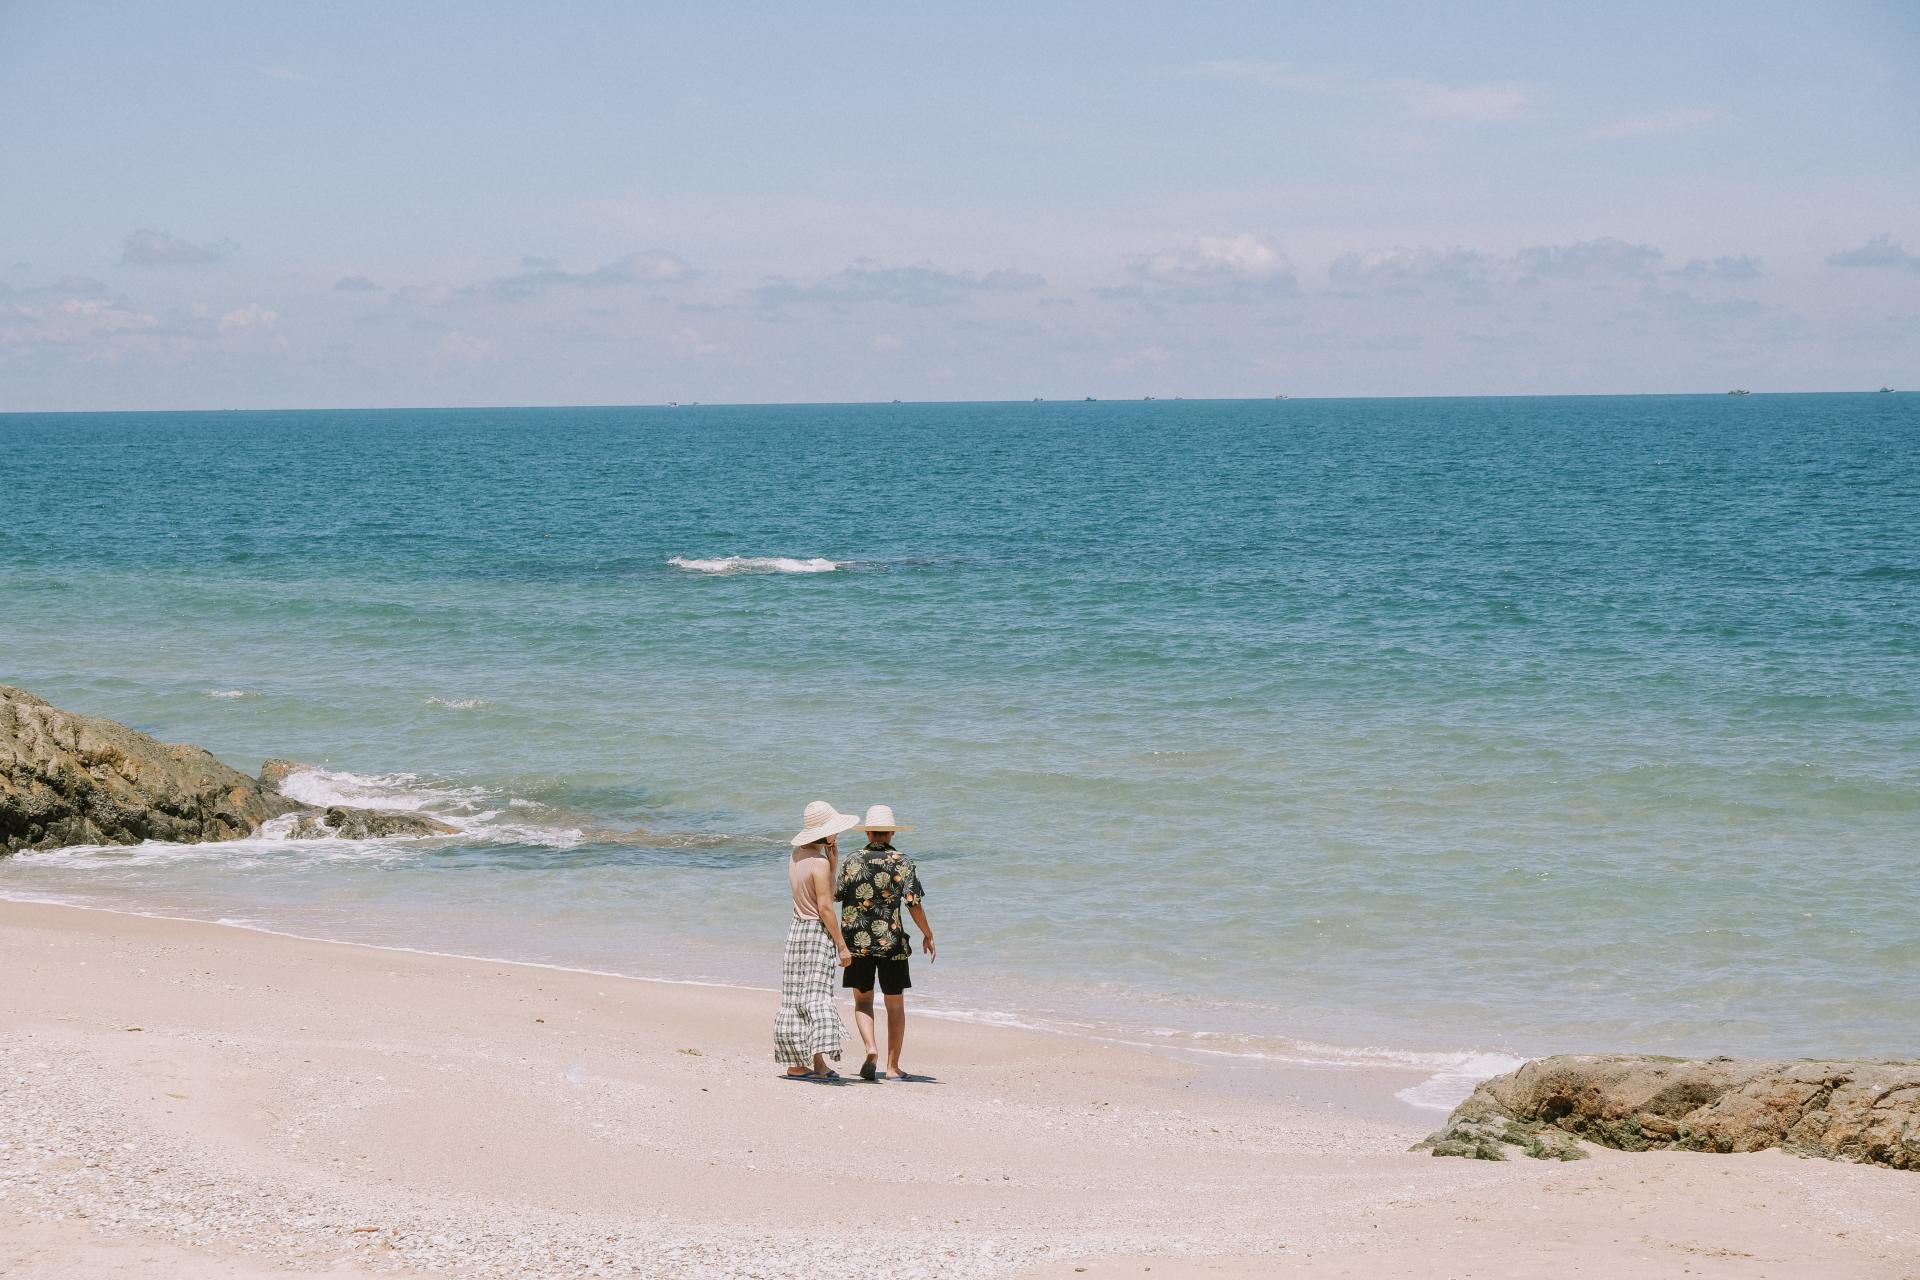 mui ne where the blue sea meets colorful sand hills